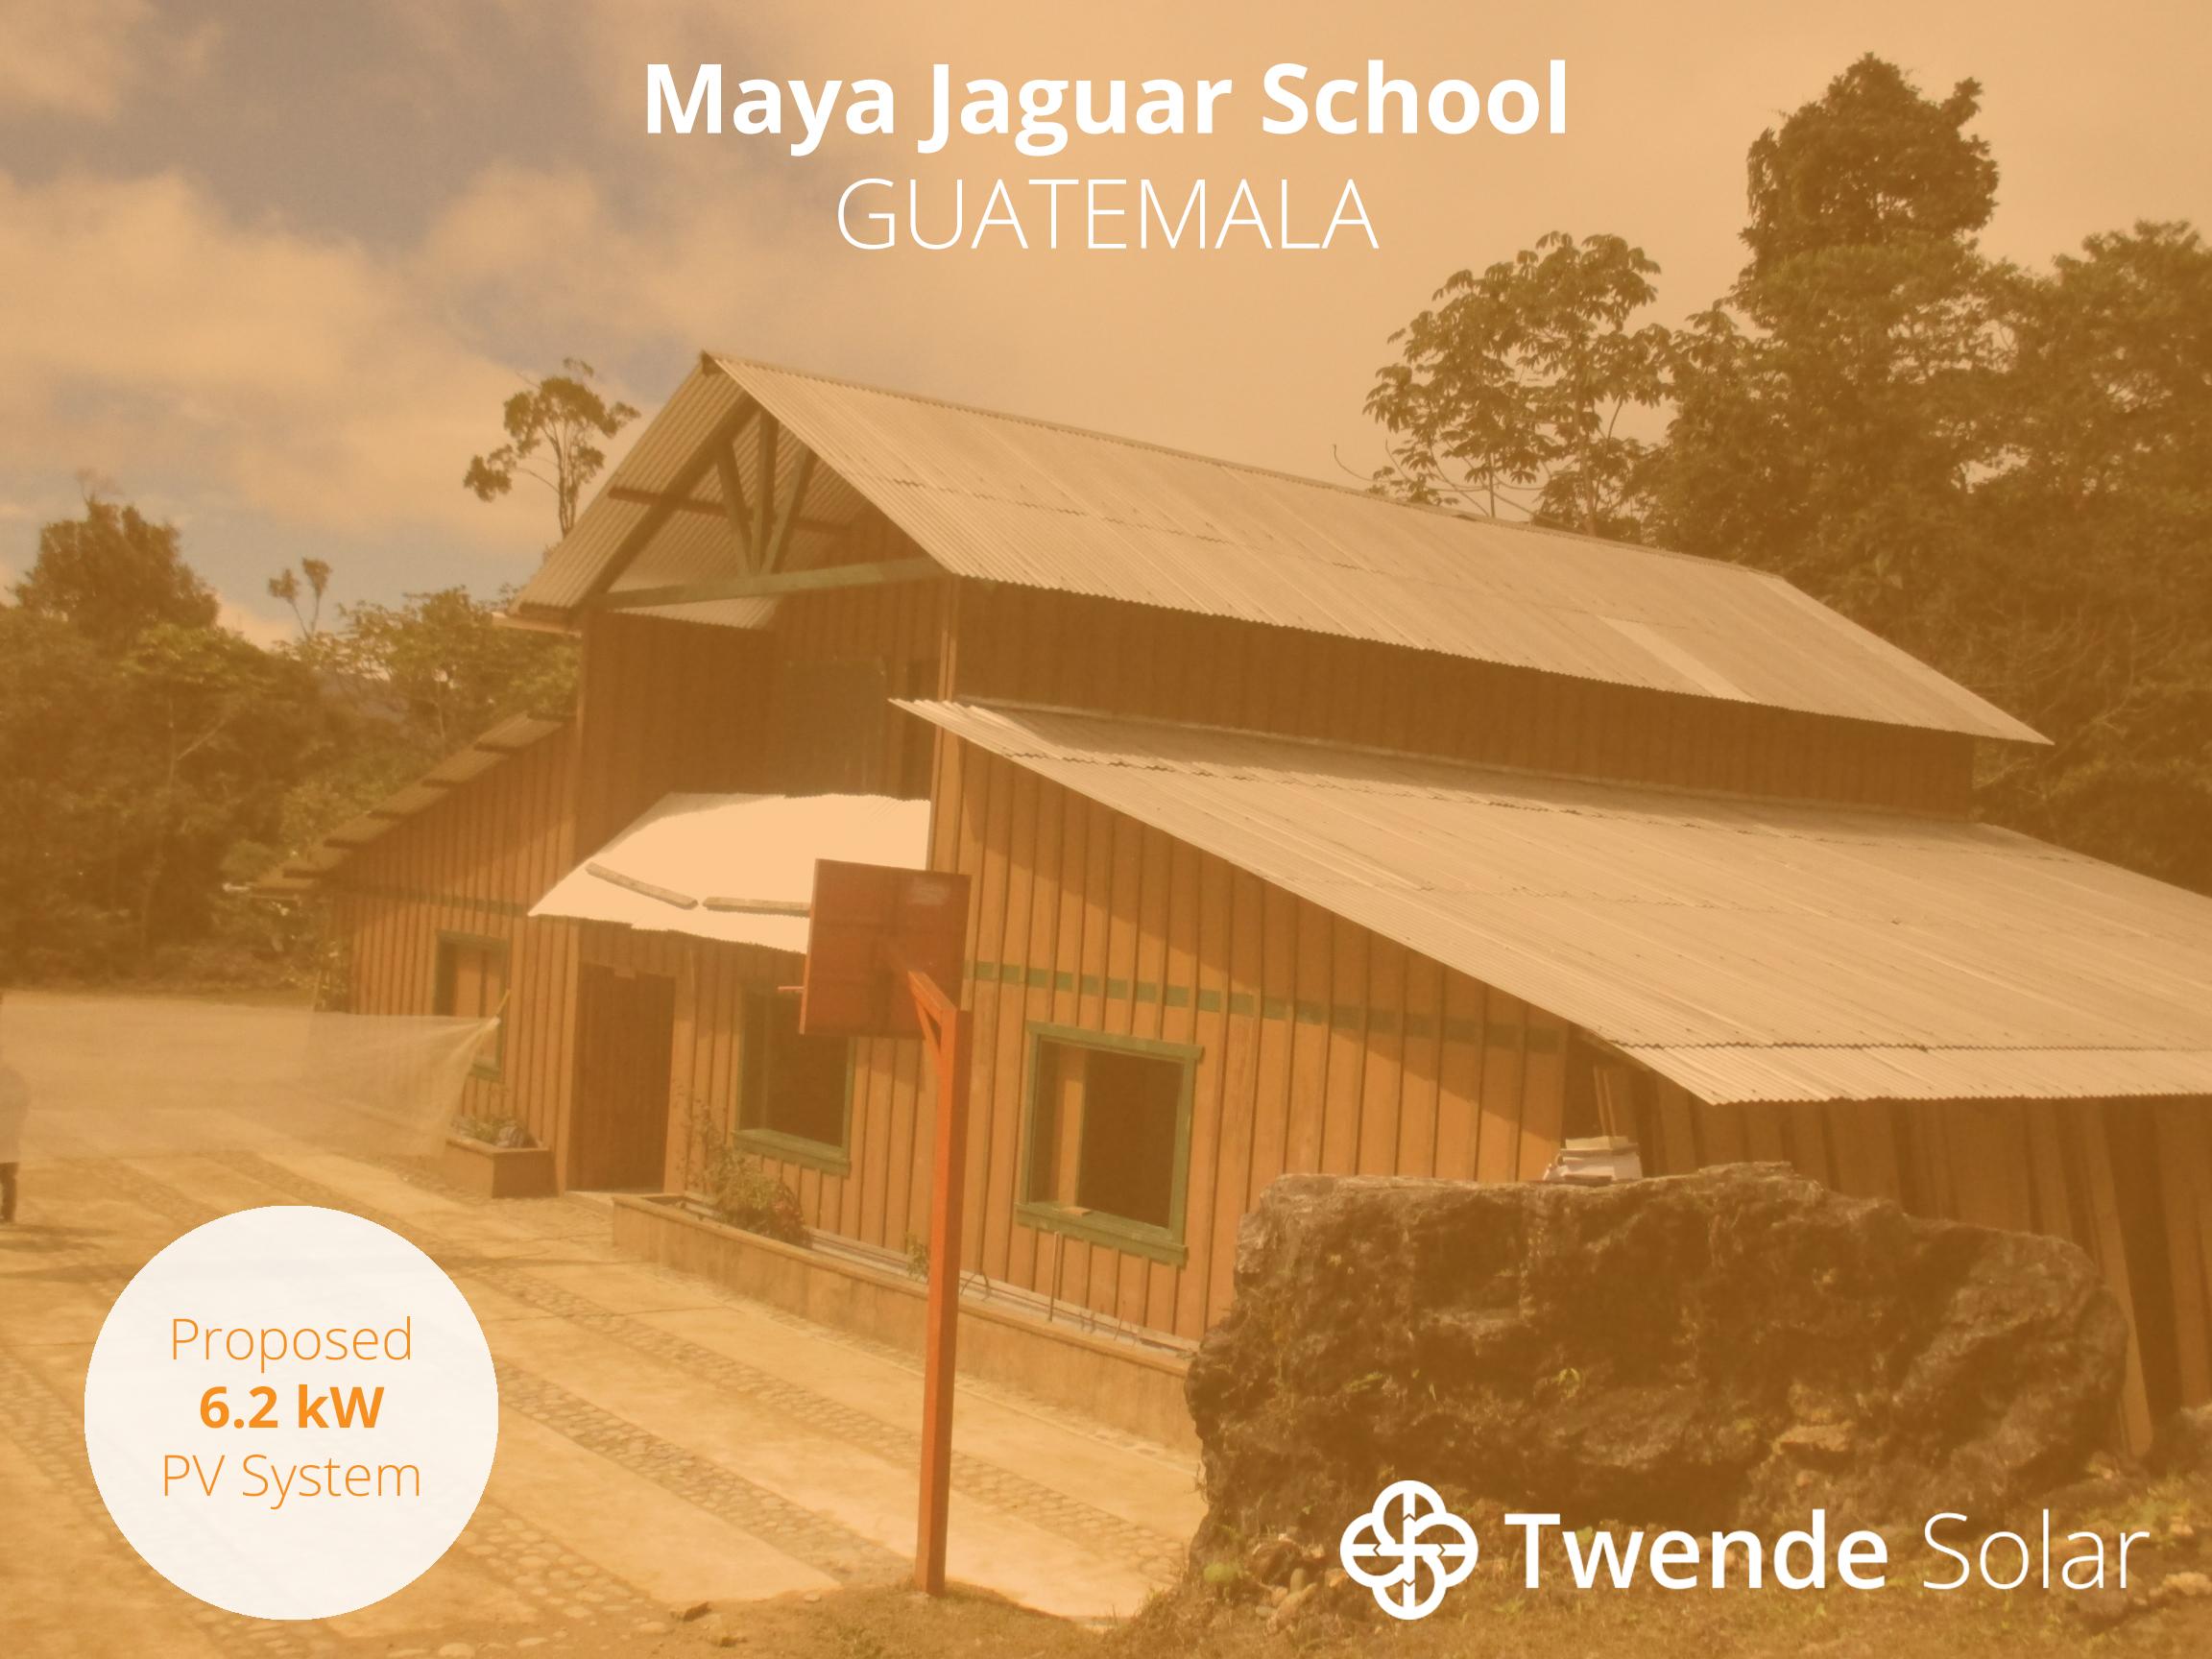 Twende Solar - Guatemala